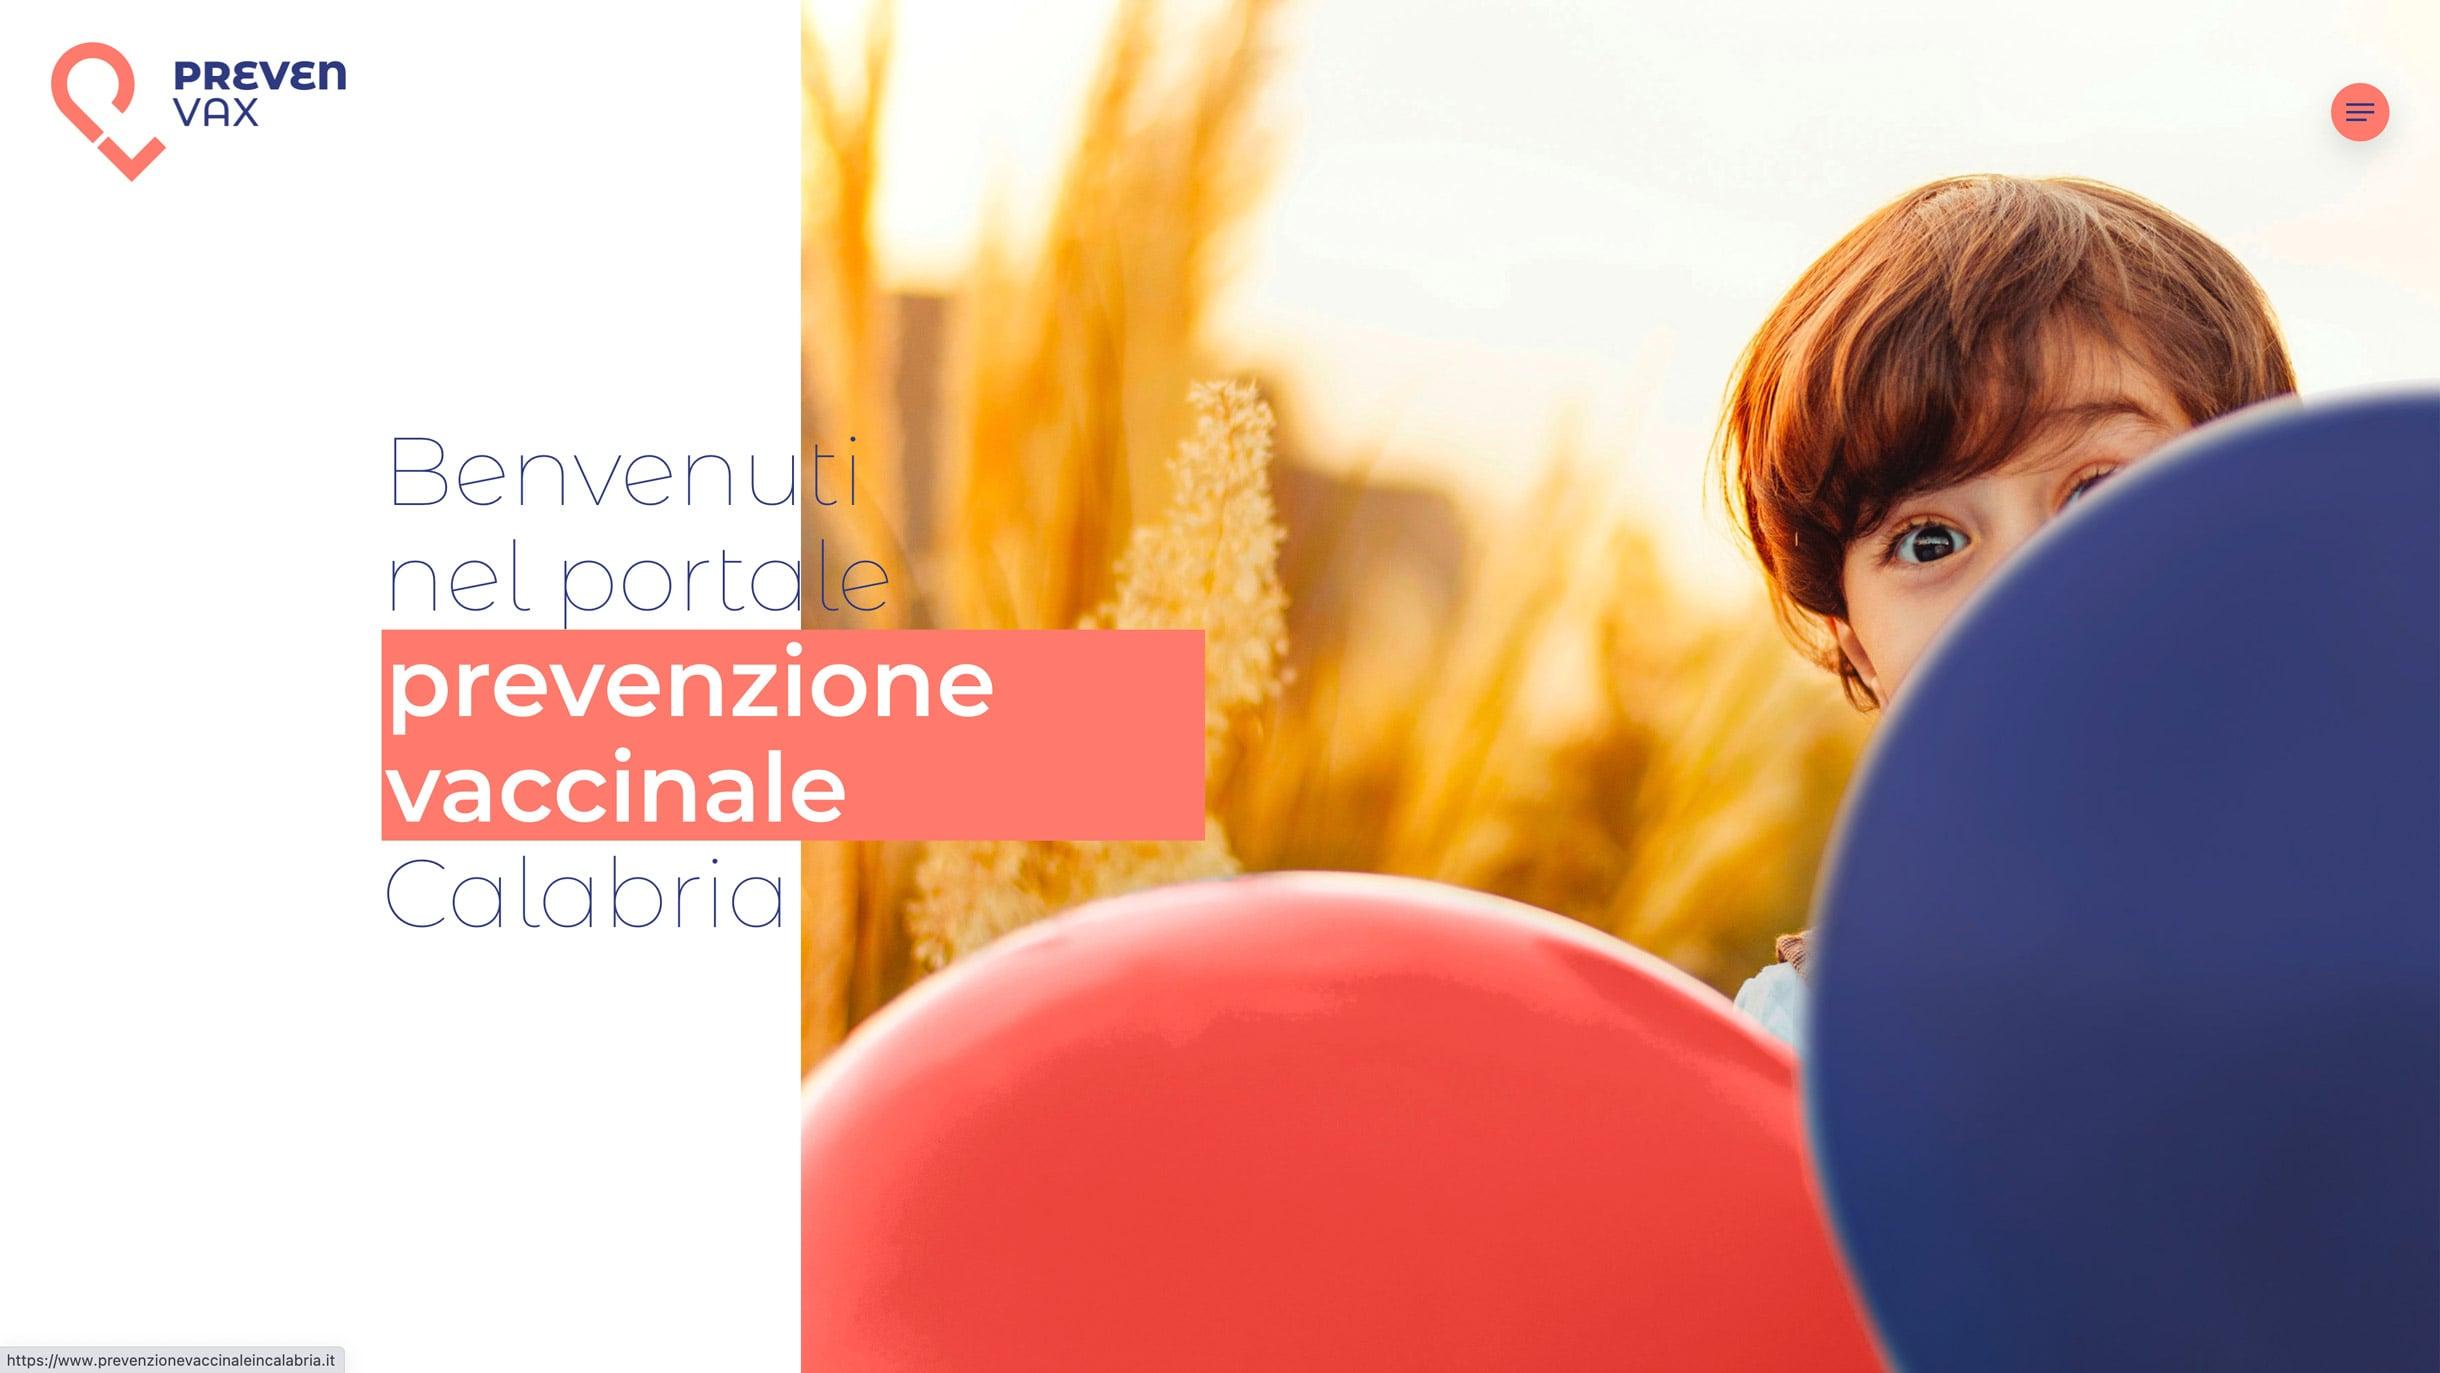 dotit-prevenvax-web-site3